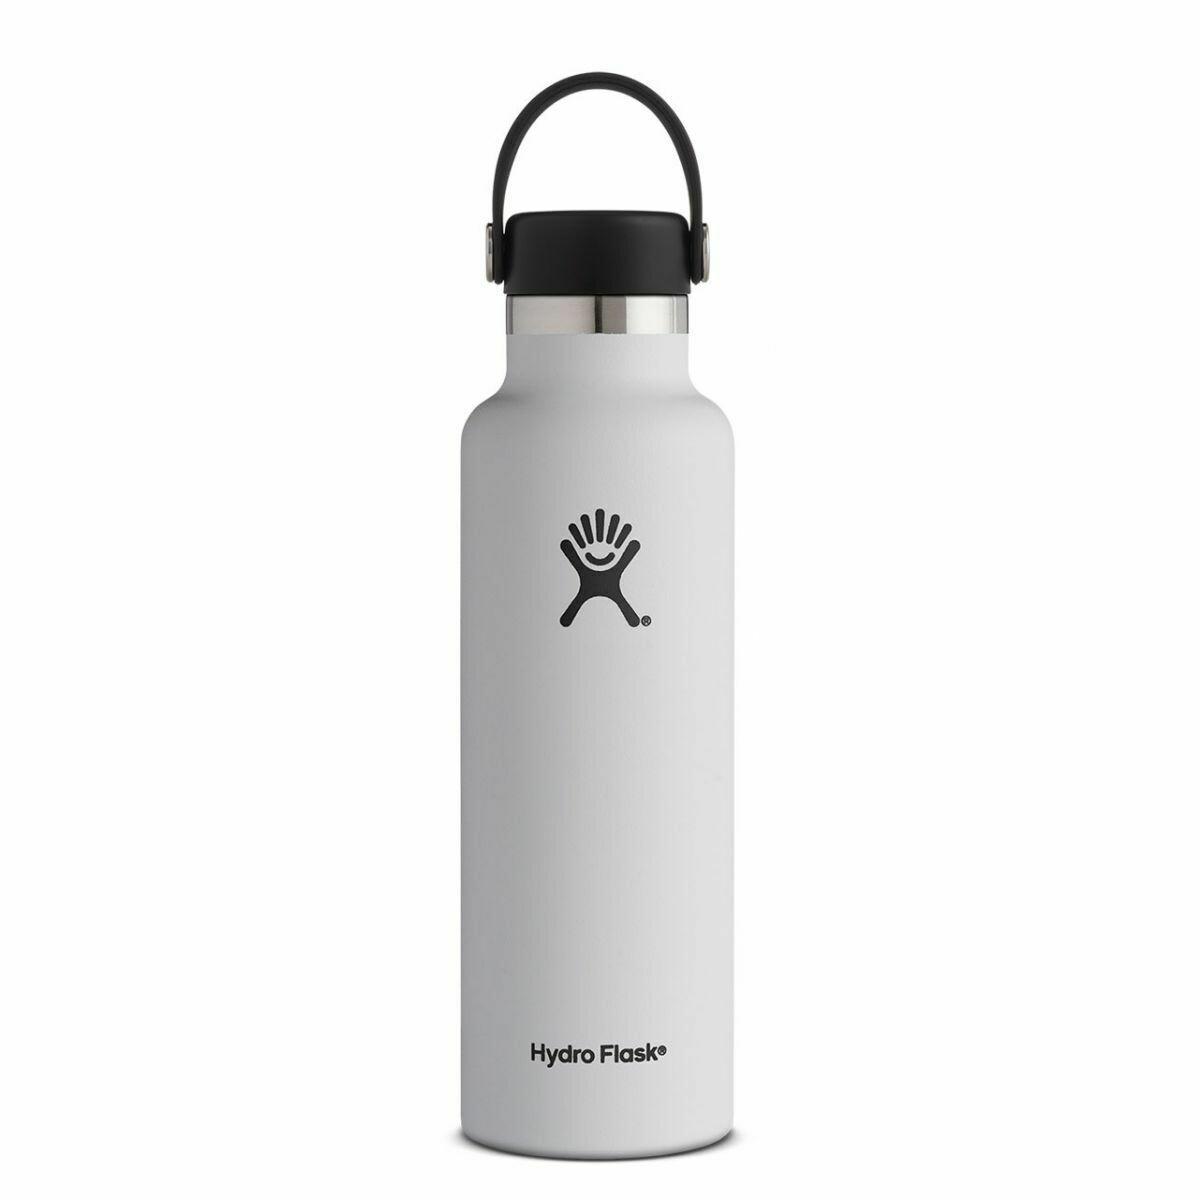 Hydro Flask 21oz Standard Mouth- White